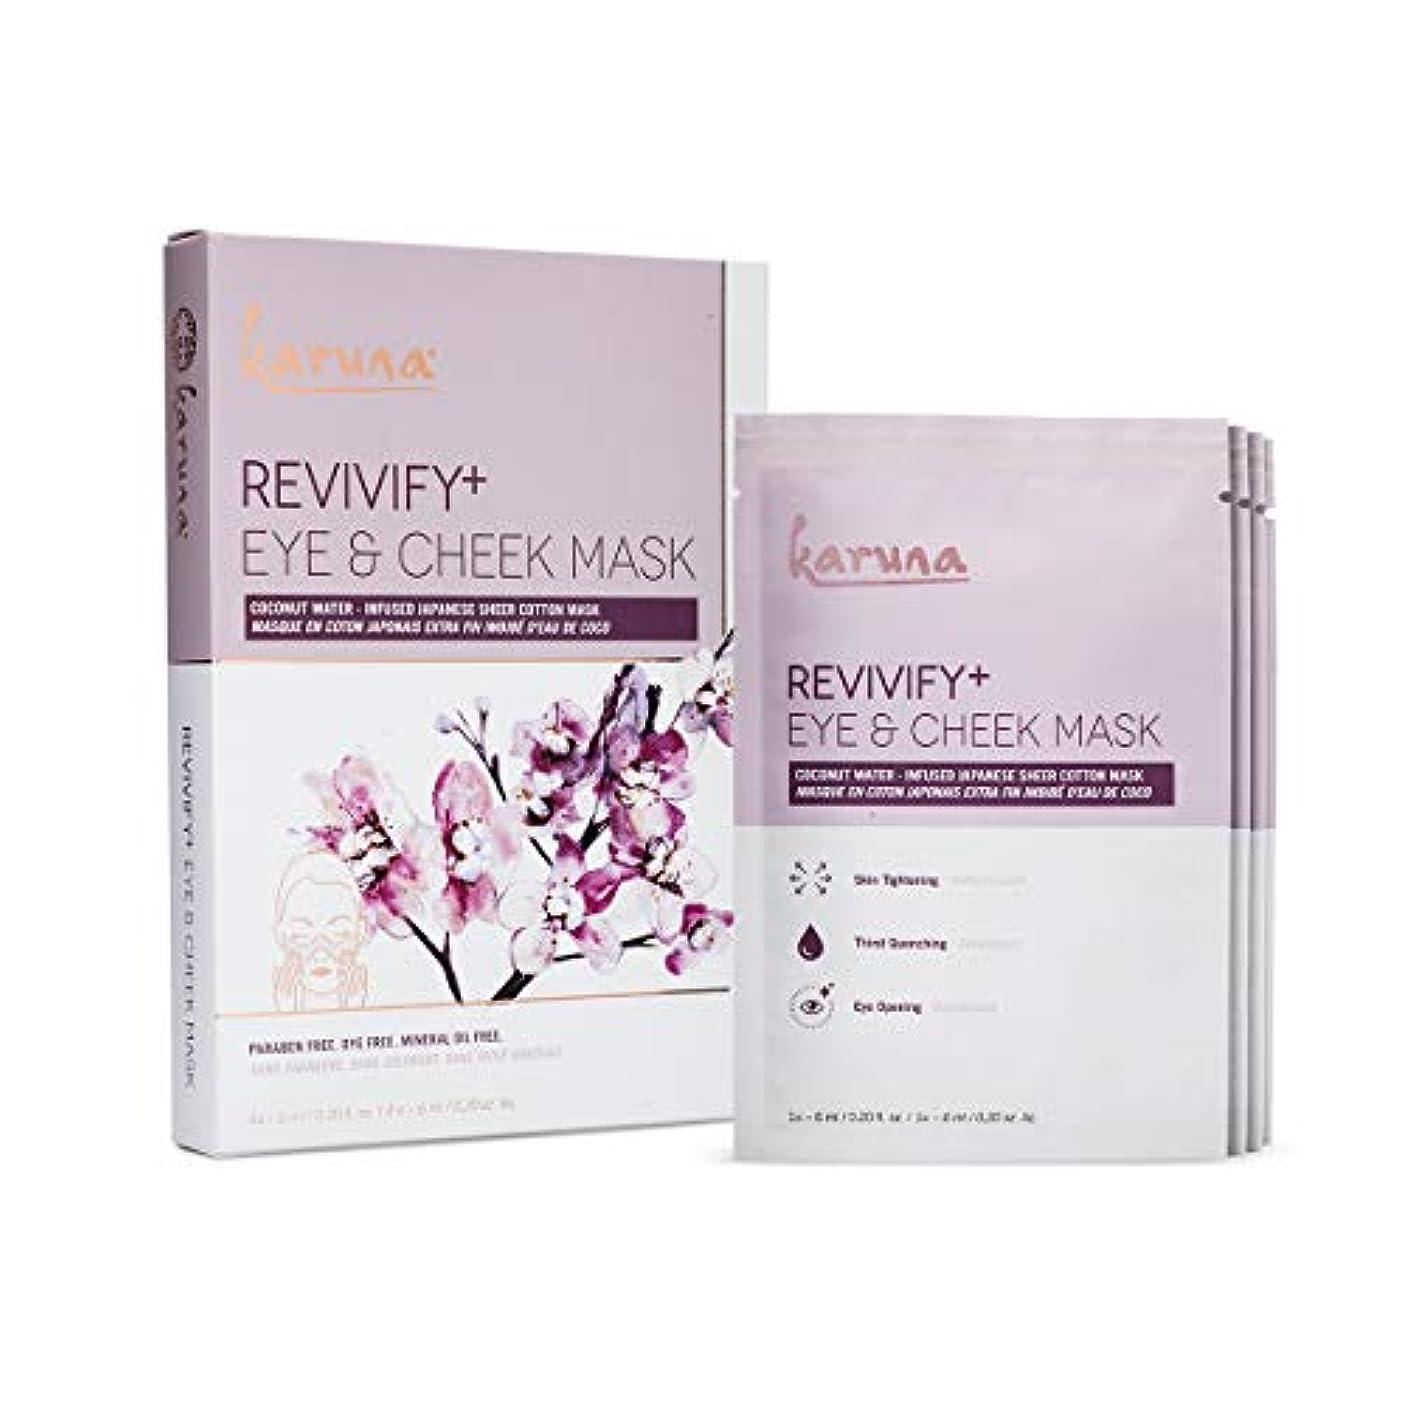 Karuna Revivify+ Eye & Cheek Mask 4sheets並行輸入品